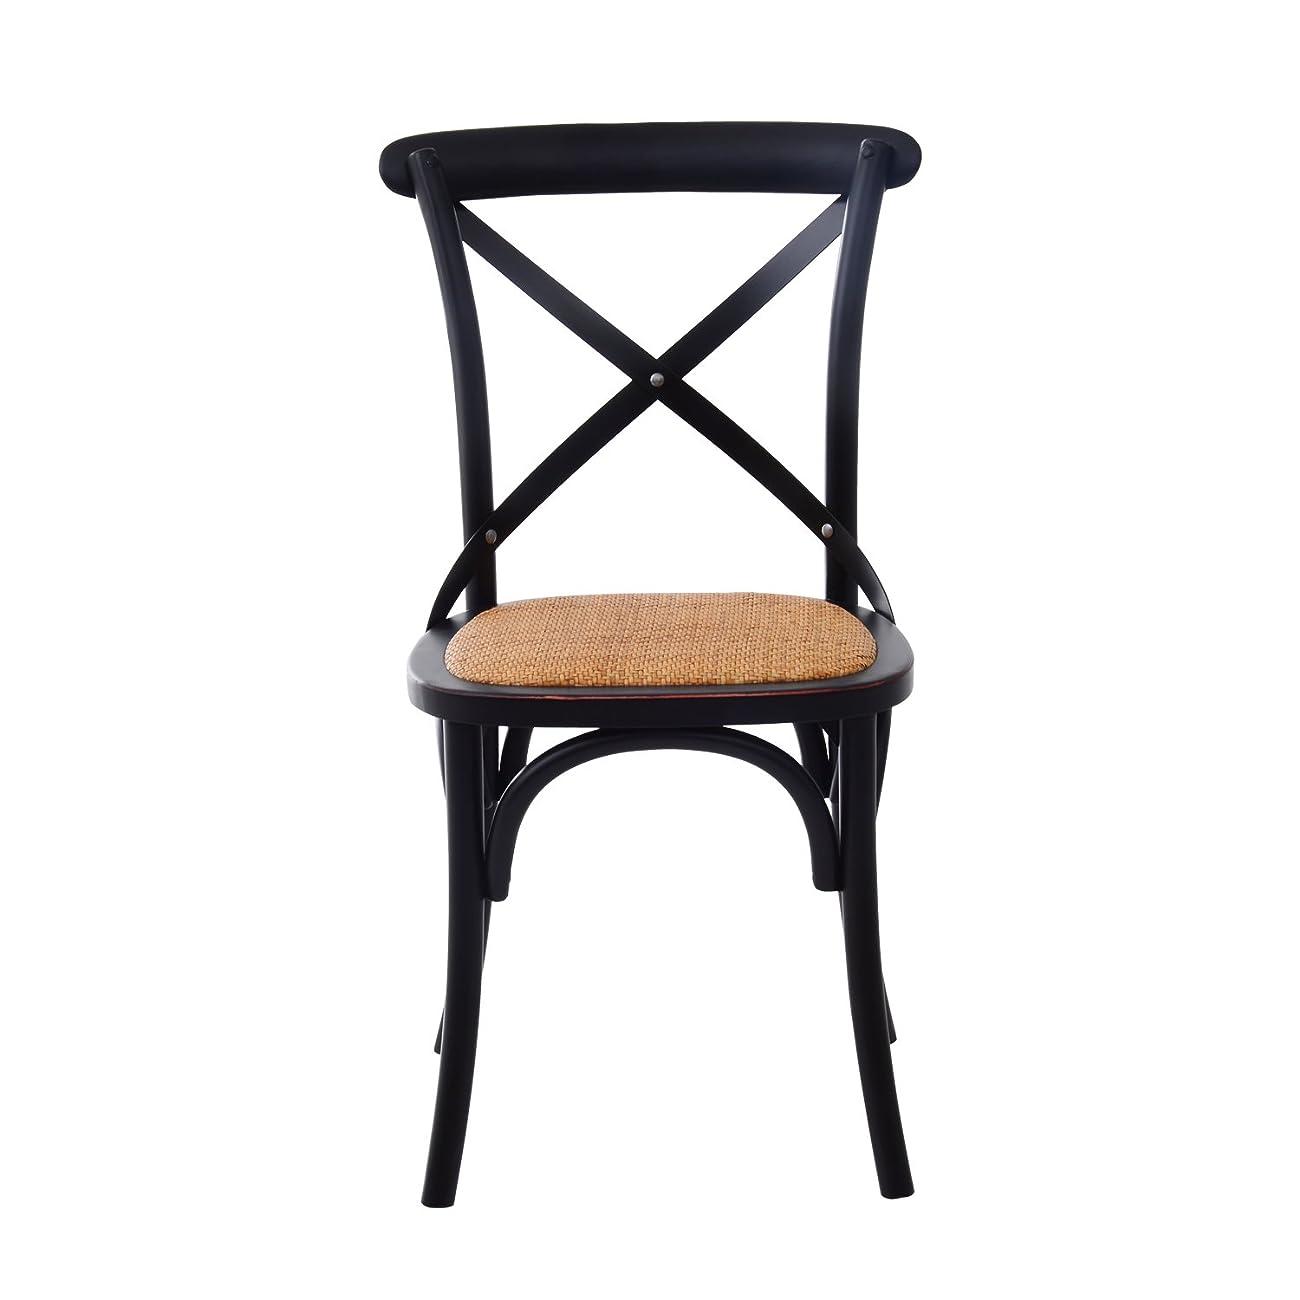 HomCom Vintage-Style X Back Elm Wood Dining Chair - Set of 2 (Black) 1